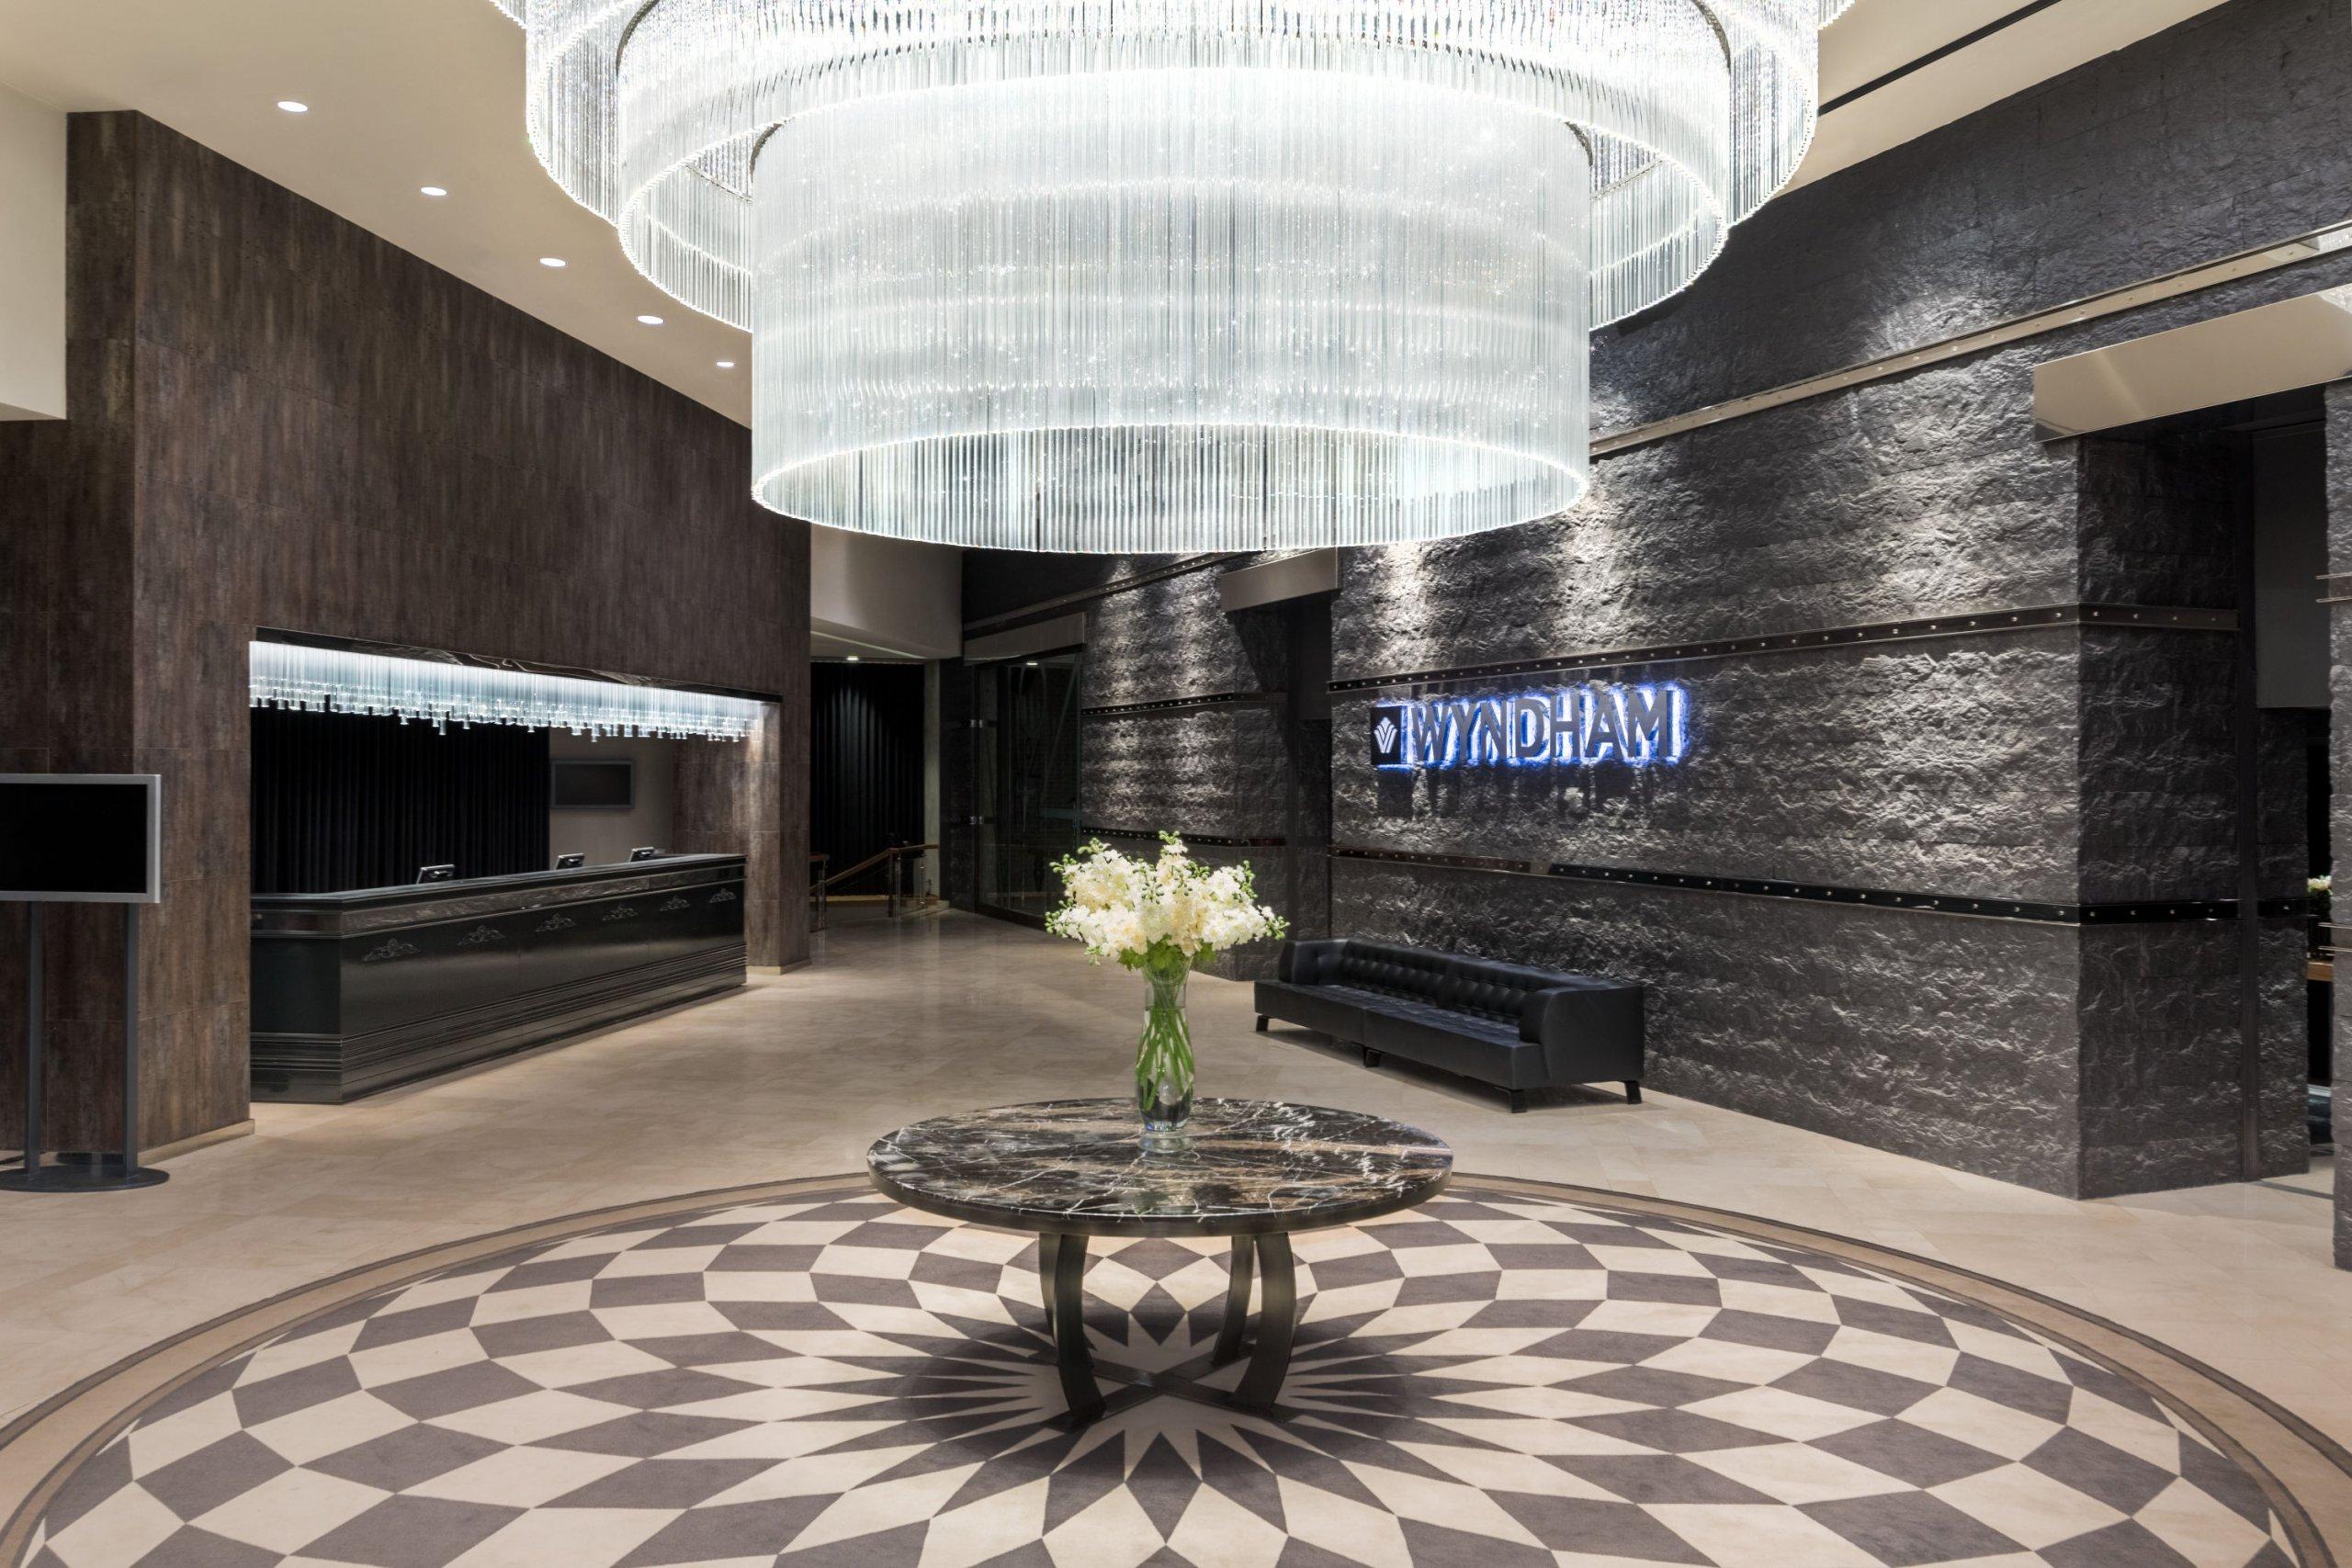 Operational Support Wyndham Hotels & Resorts